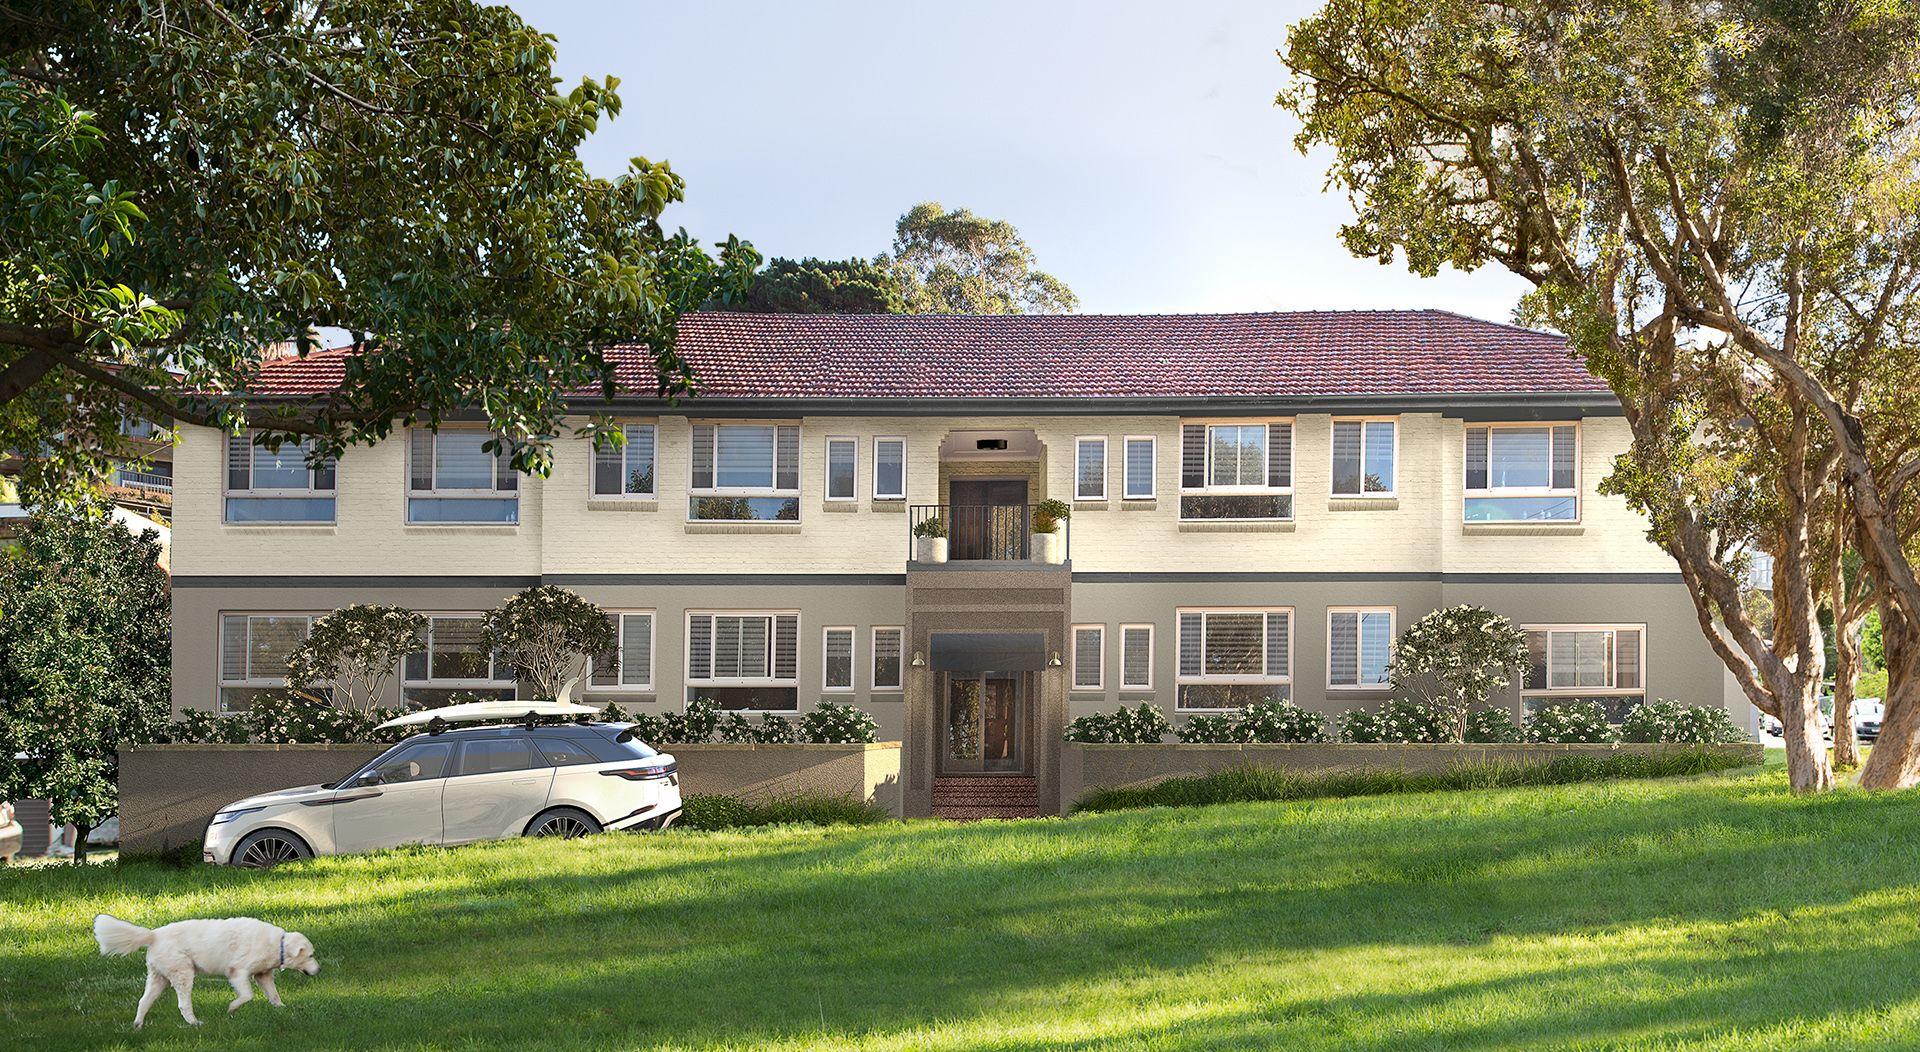 13/64 Brown Street, Bronte NSW 2024, Image 0